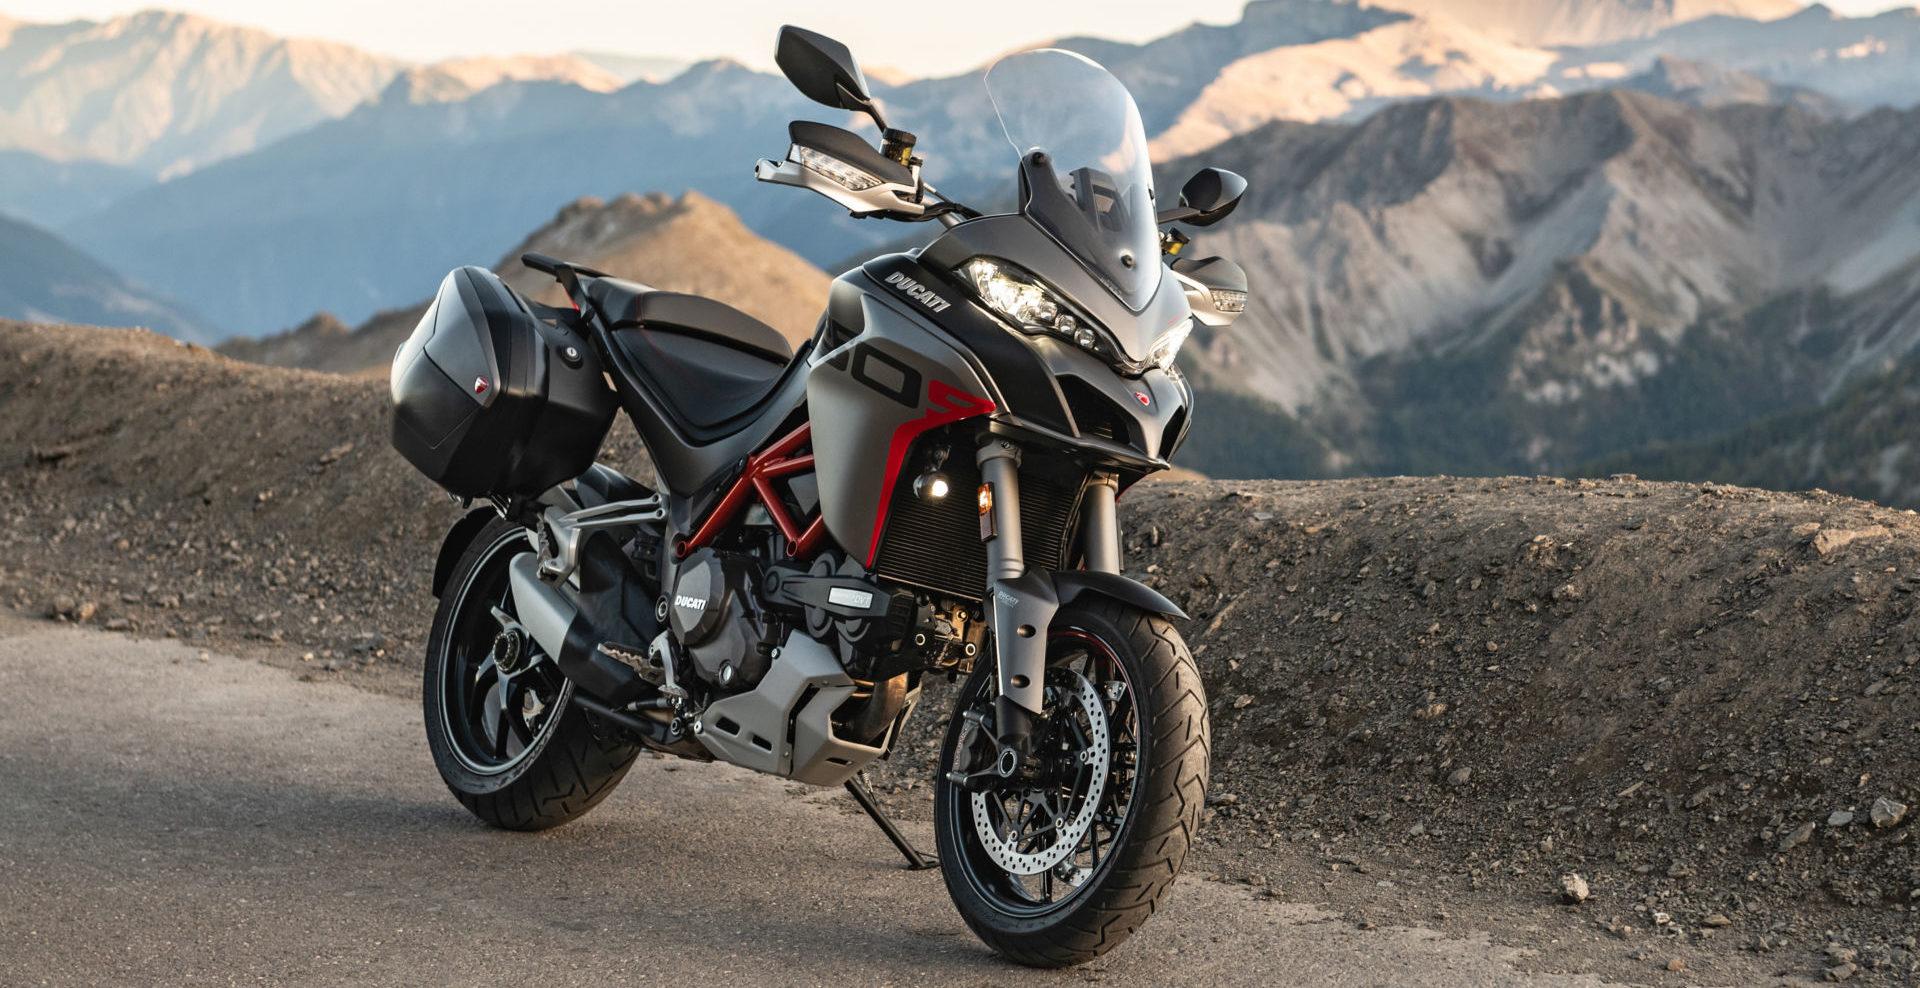 Ducati credits bikes like the Multistrada 1260 S Grand Tour for its success in 2019. Photo courtesy of Ducati.